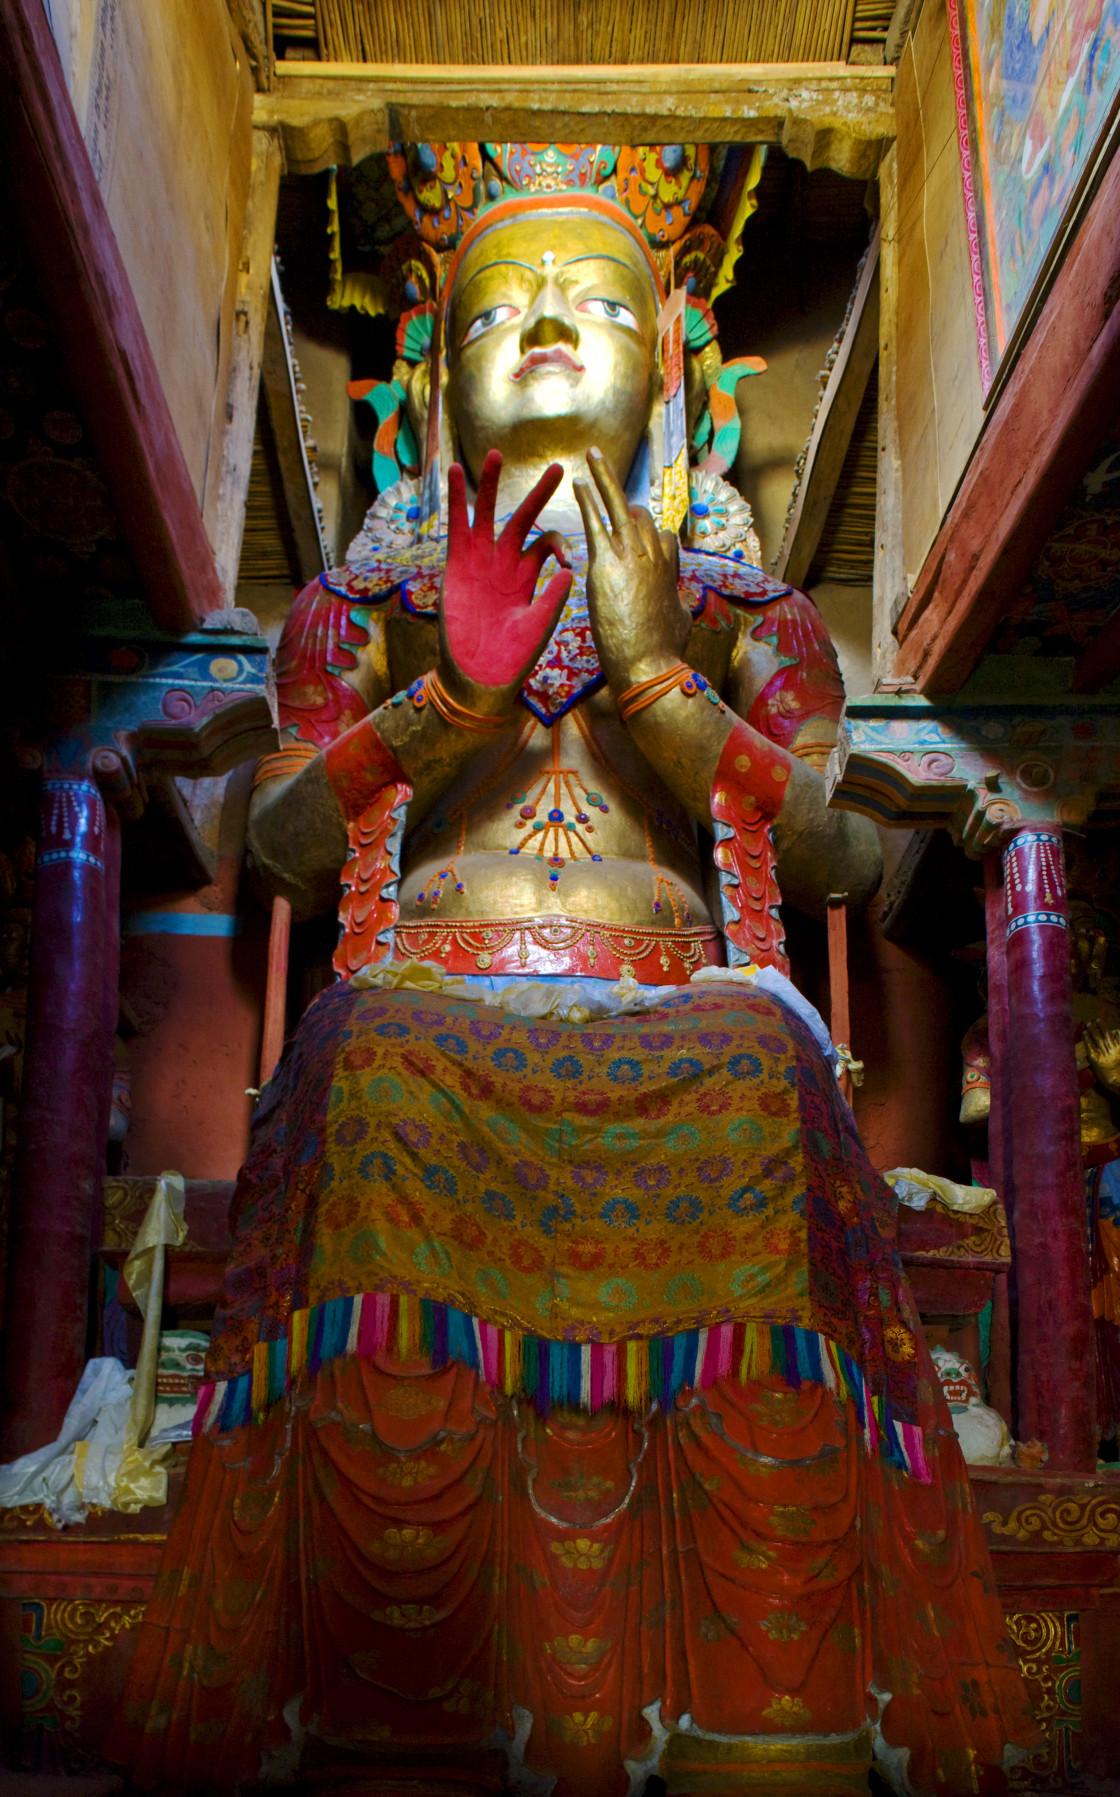 """Maitreya Buddha statue, Thiksey, Ladakh"" stock image"